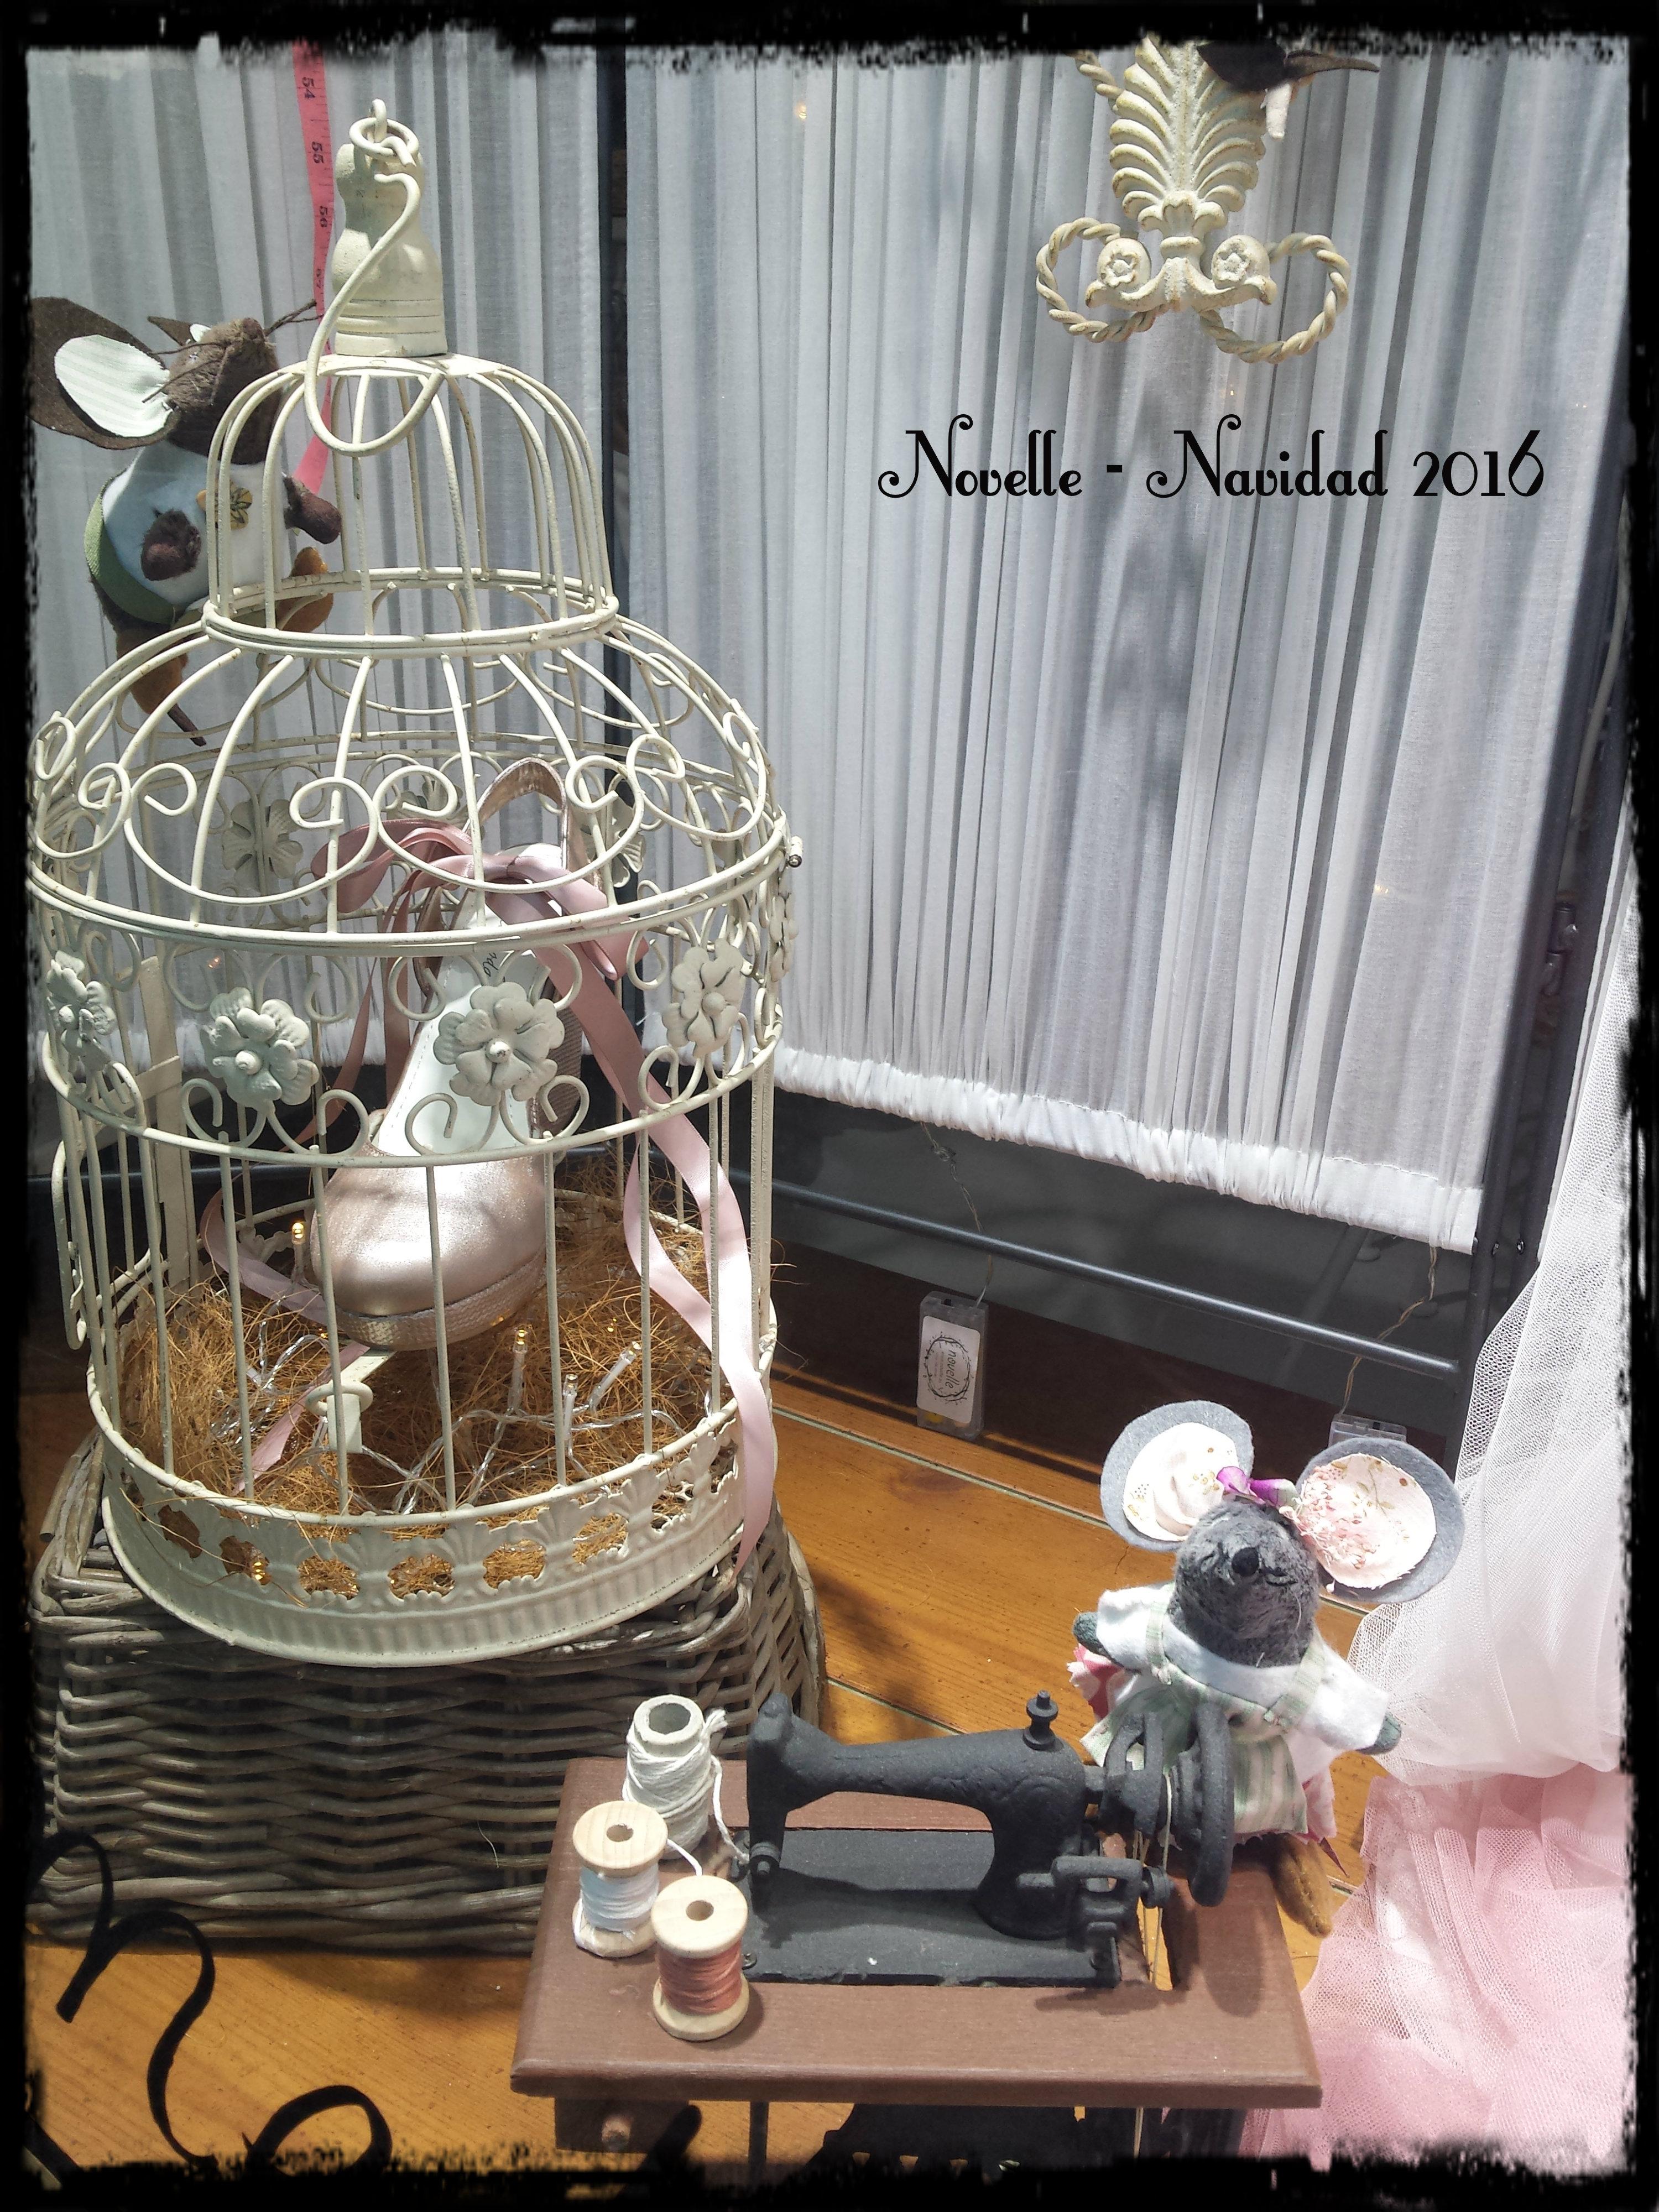 novelle-escaparate-navidad-2016-cenicienta-6